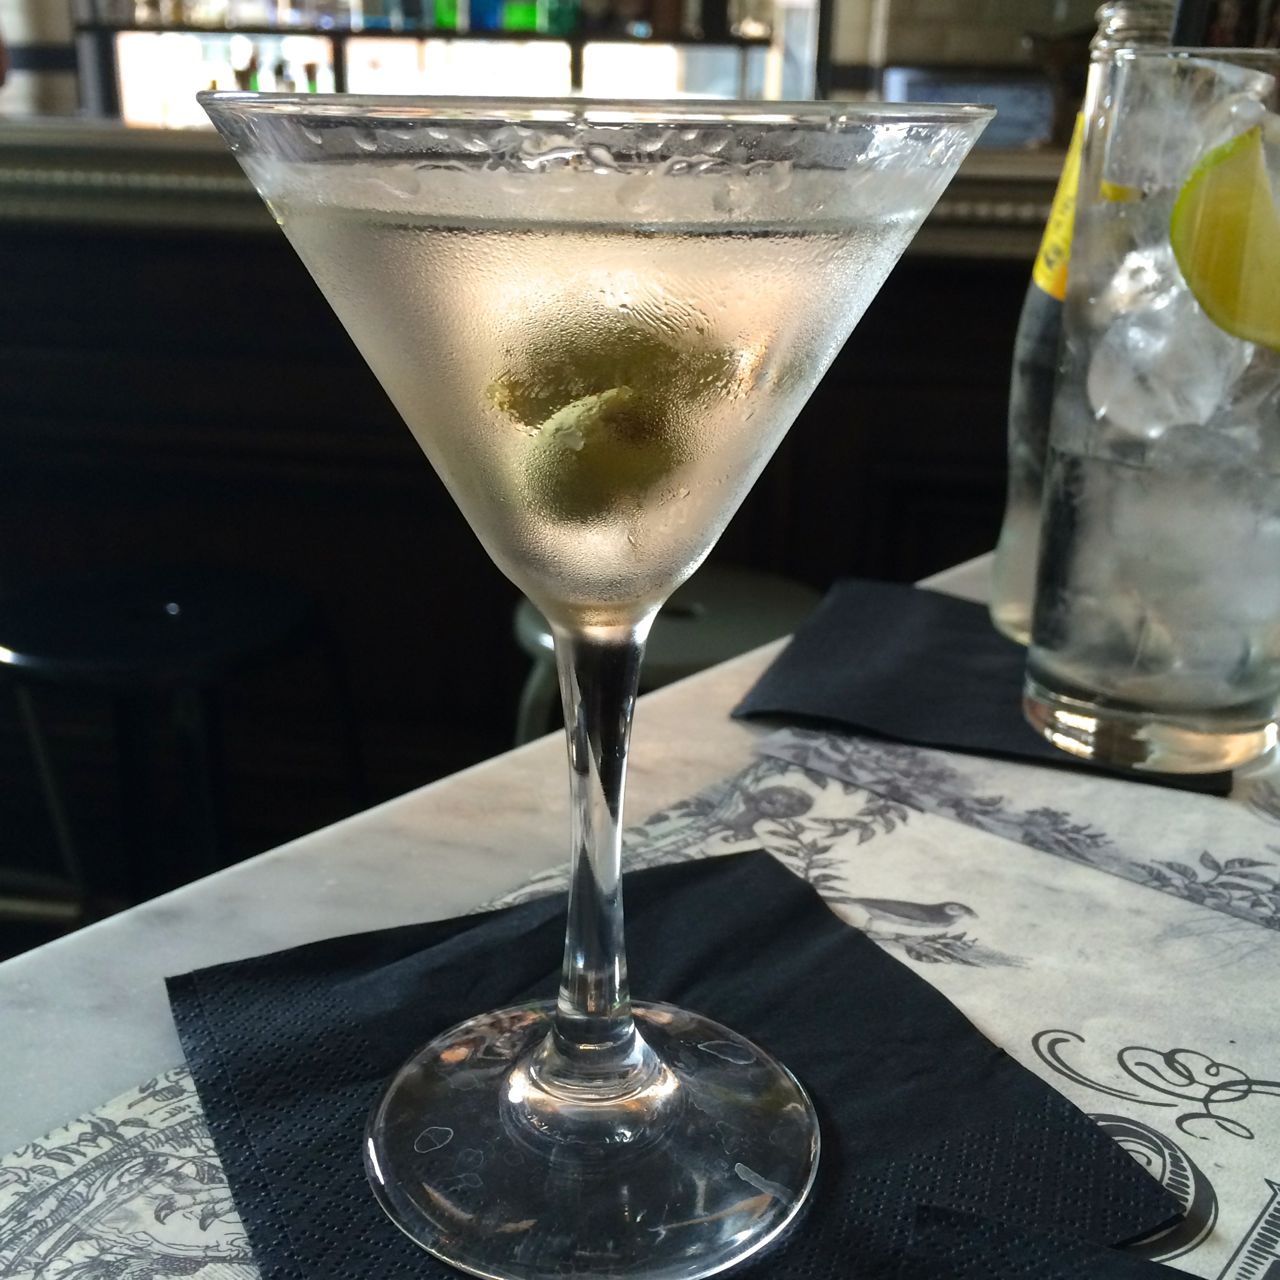 perfectly dry grey goose martini at caffe propaganda in rome